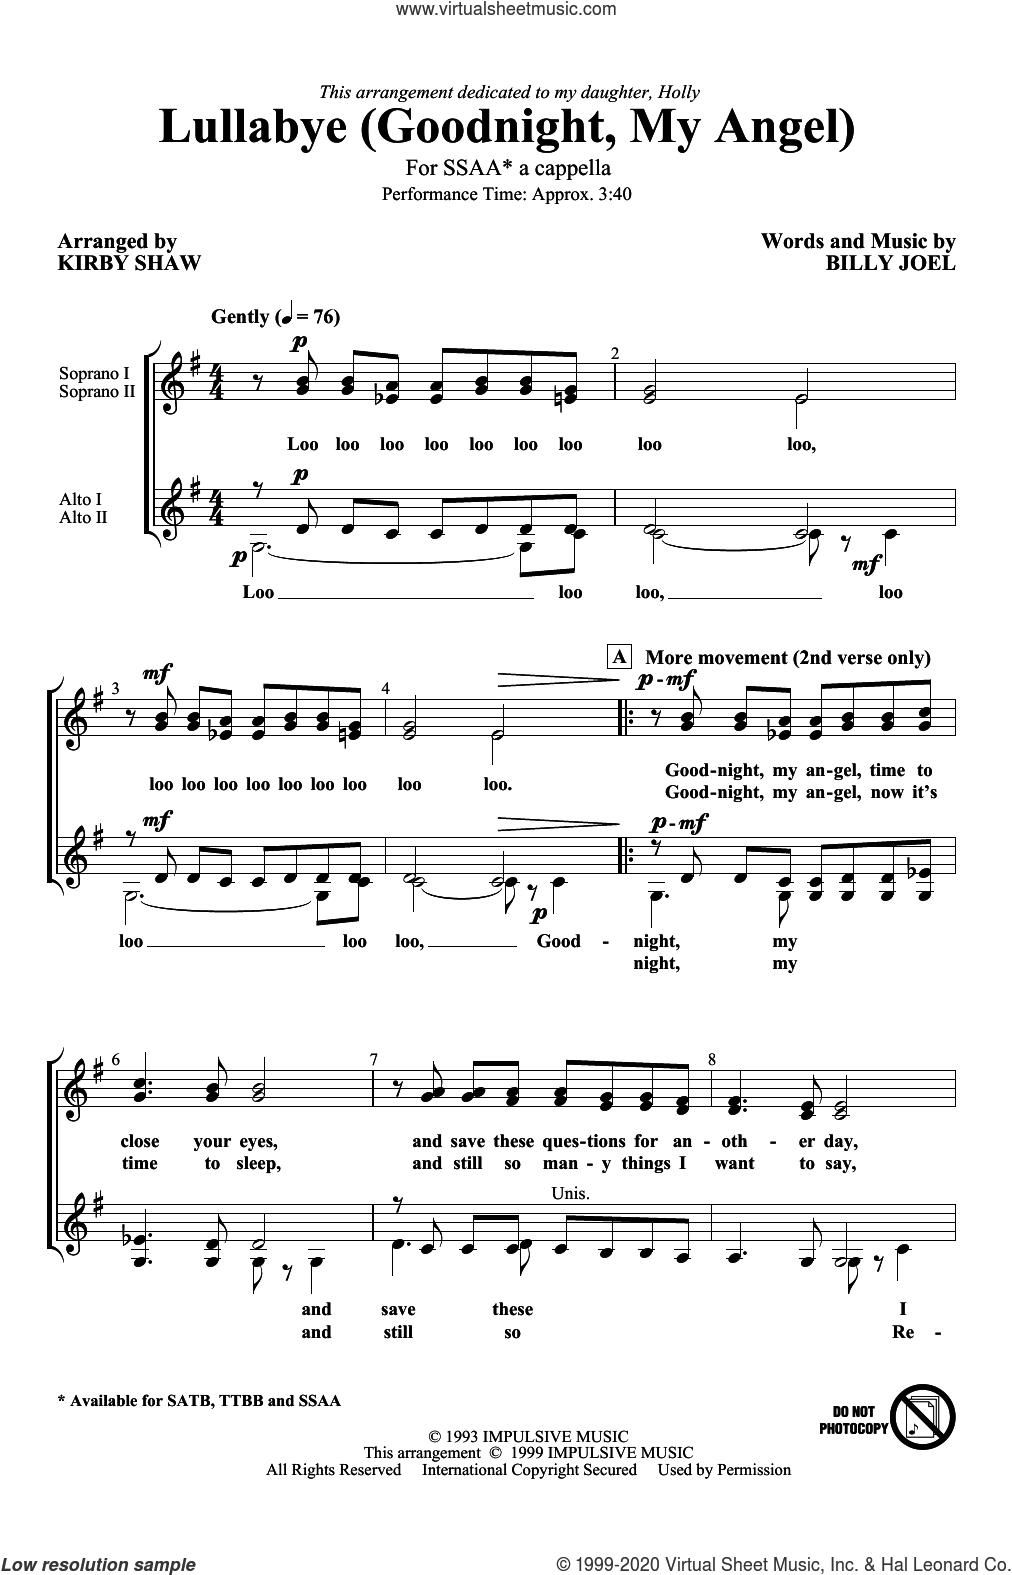 Lullabye (Goodnight, My Angel) (arr. Kirby Shaw) sheet music for choir (SSAA: soprano, alto) by Billy Joel and Kirby Shaw, intermediate skill level